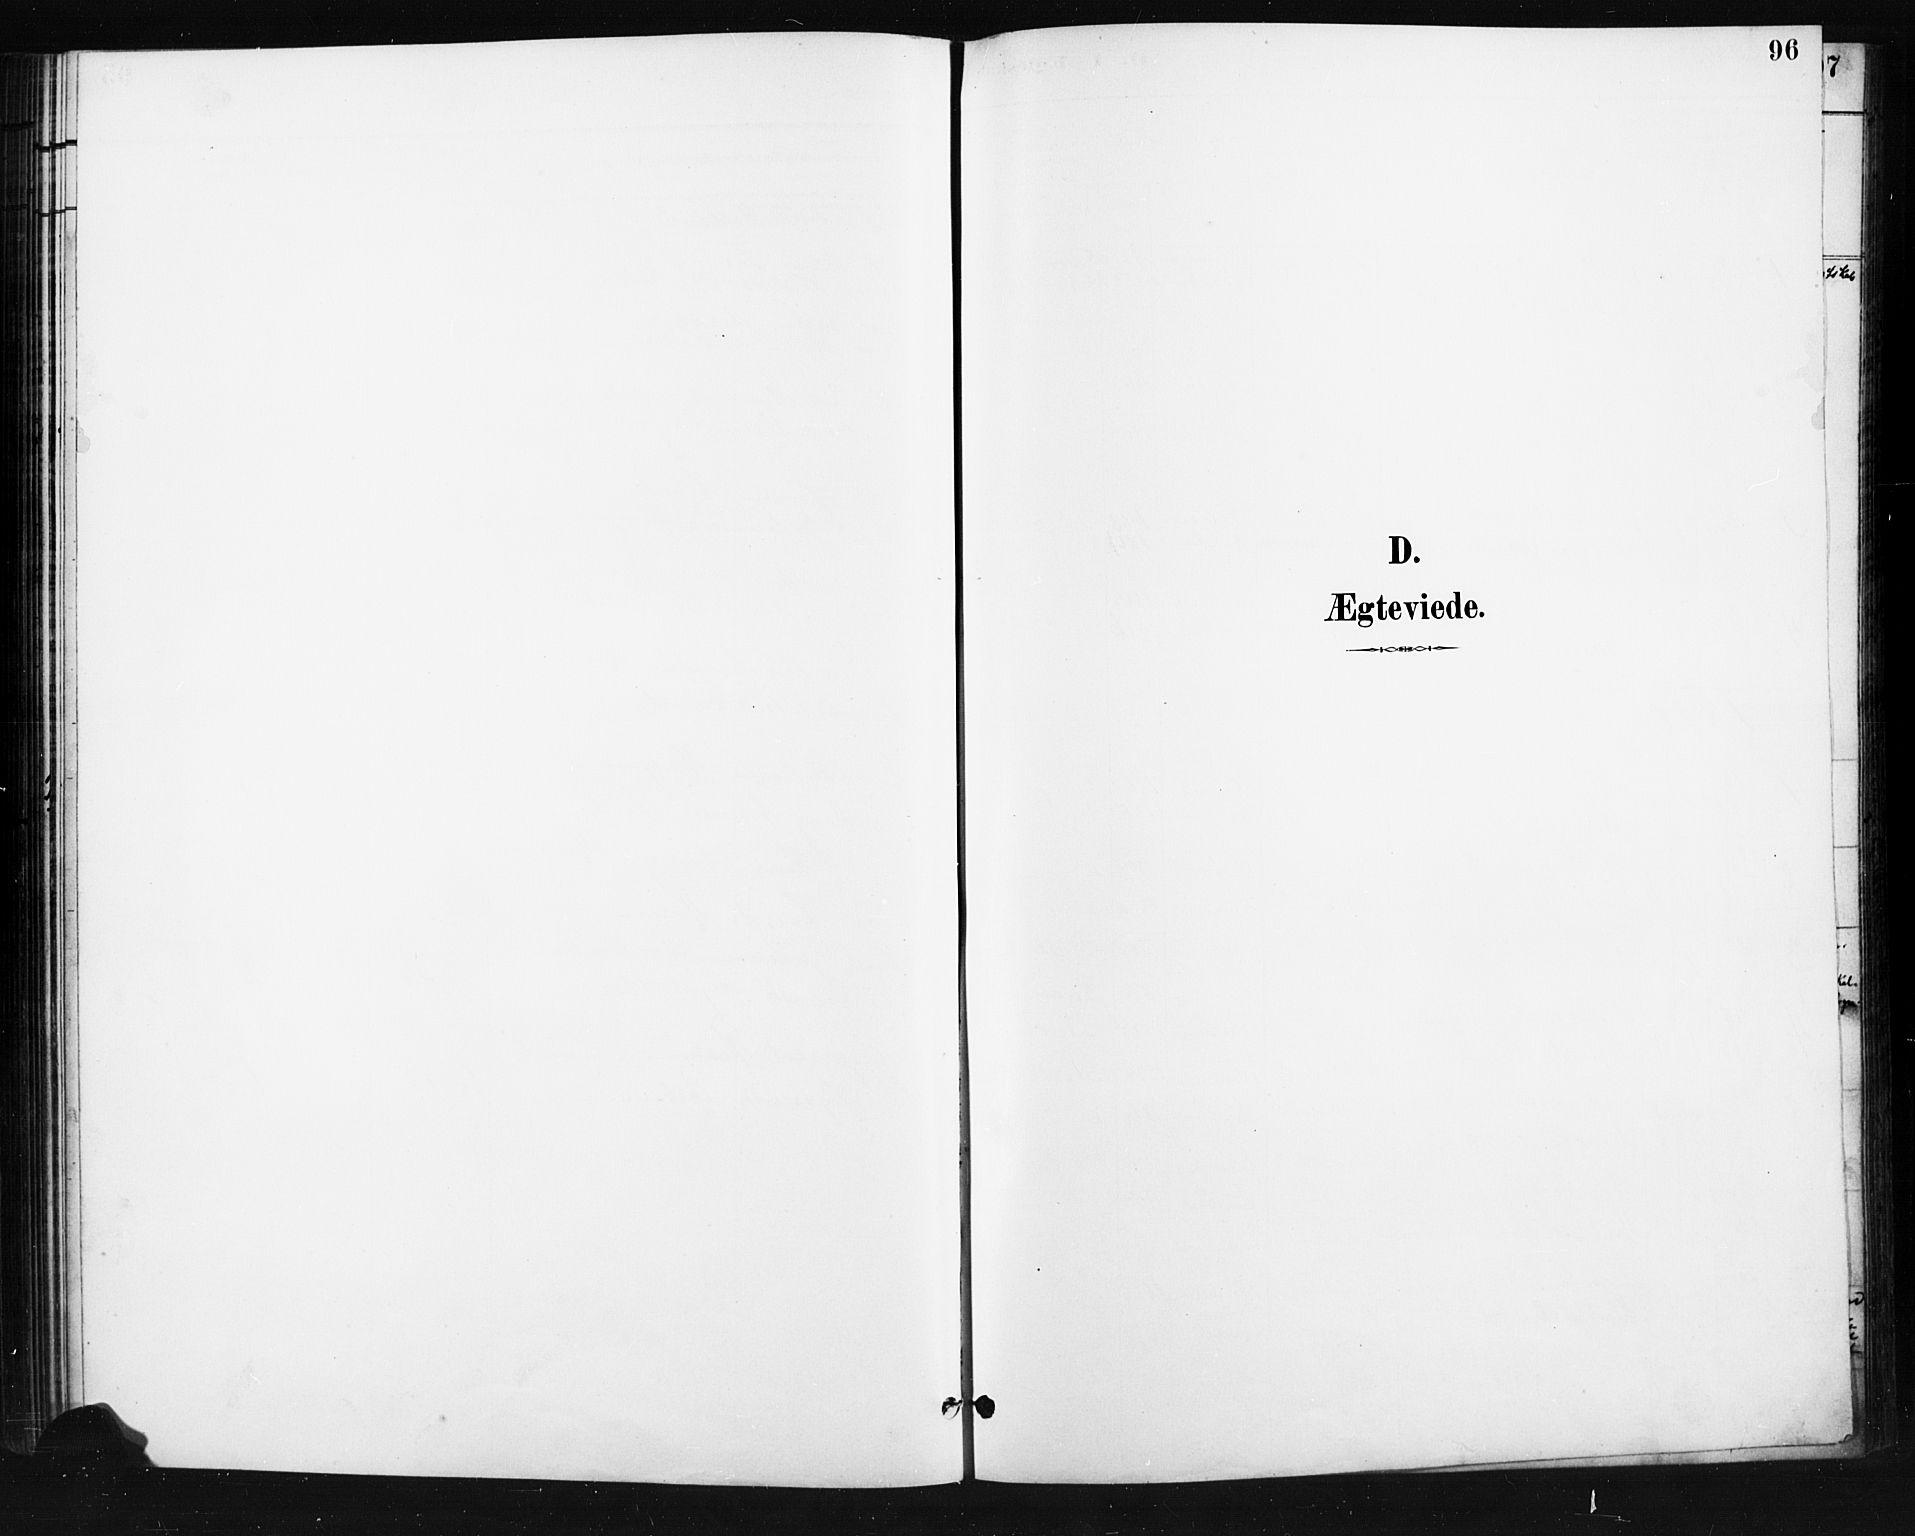 SAH, Skjåk prestekontor, Klokkerbok nr. 4, 1895-1921, s. 96